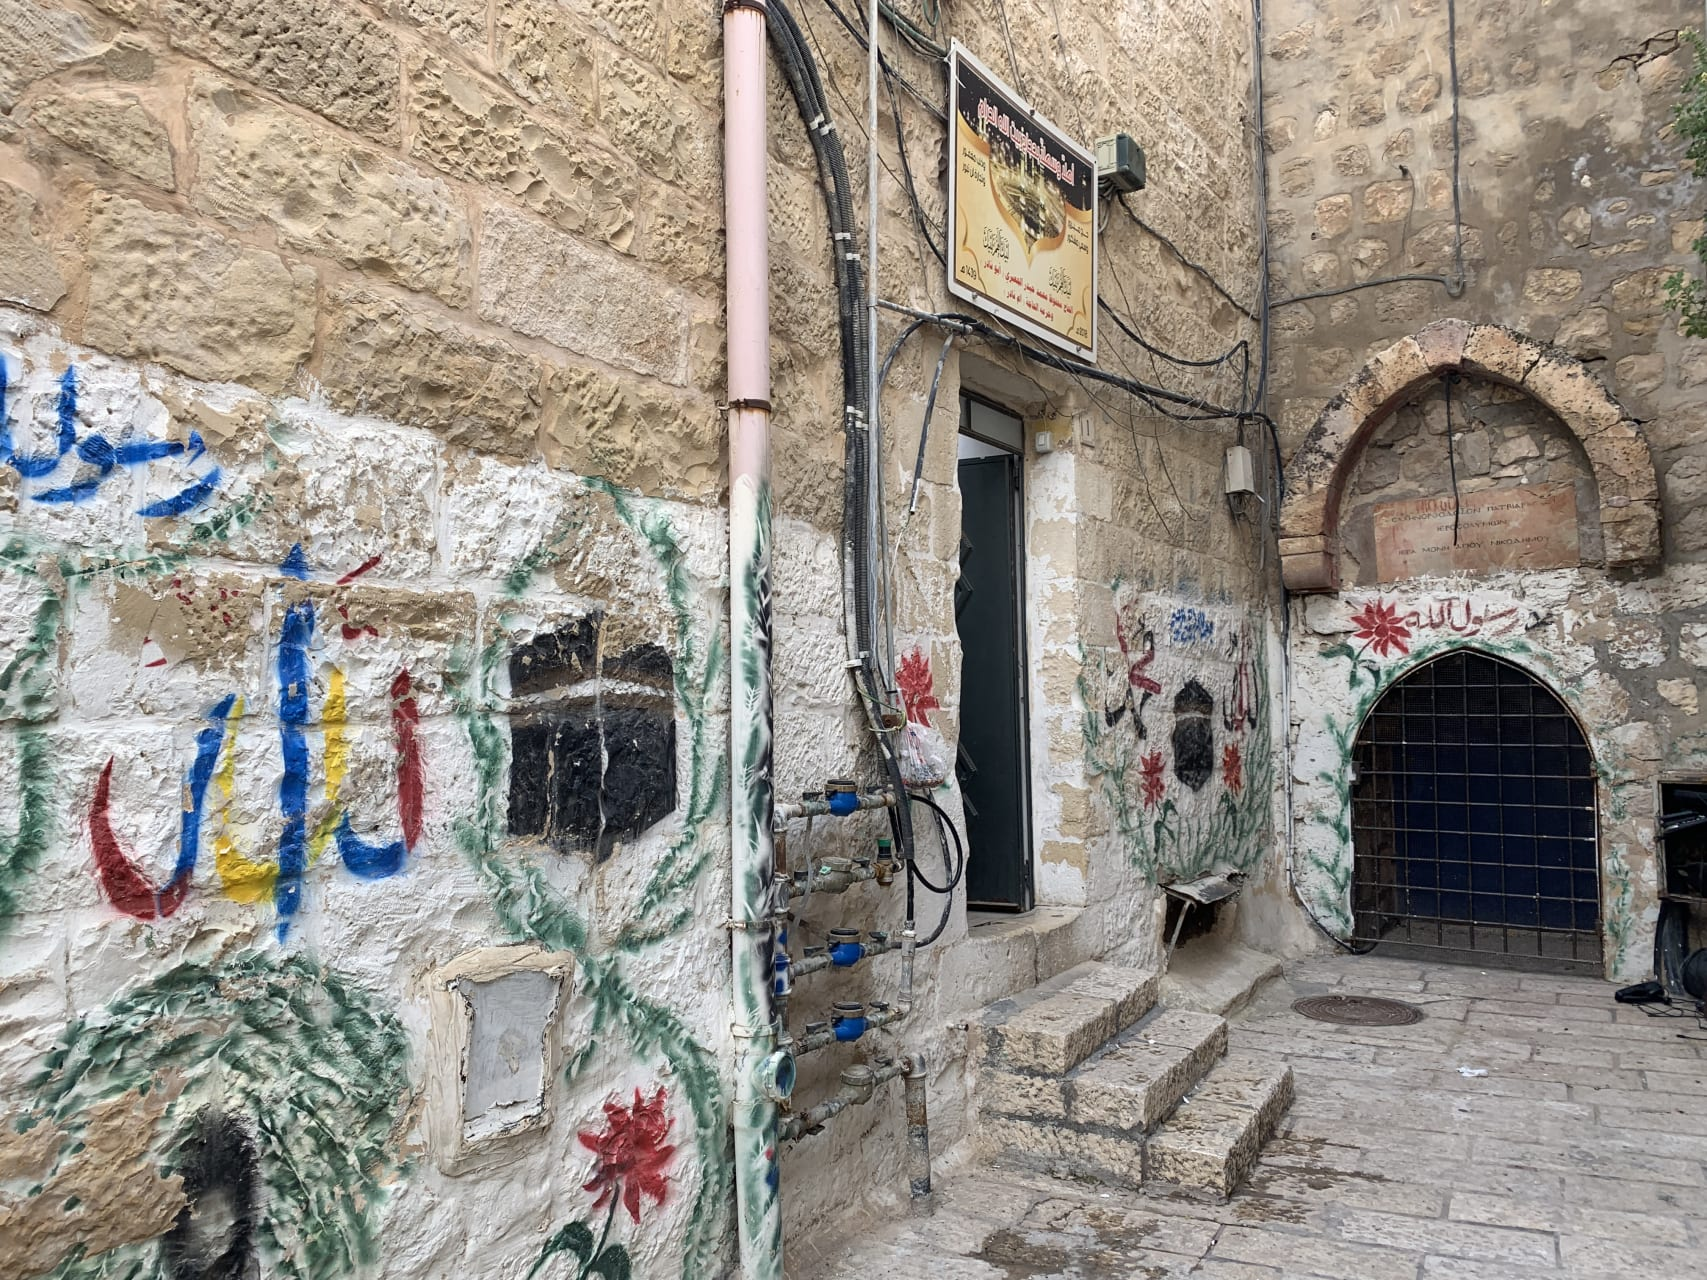 Jerusalem - Experiment - Live from home - The Muslim Quarter in Al-Quds Jerusalem  الحي الاسلامي في القدس